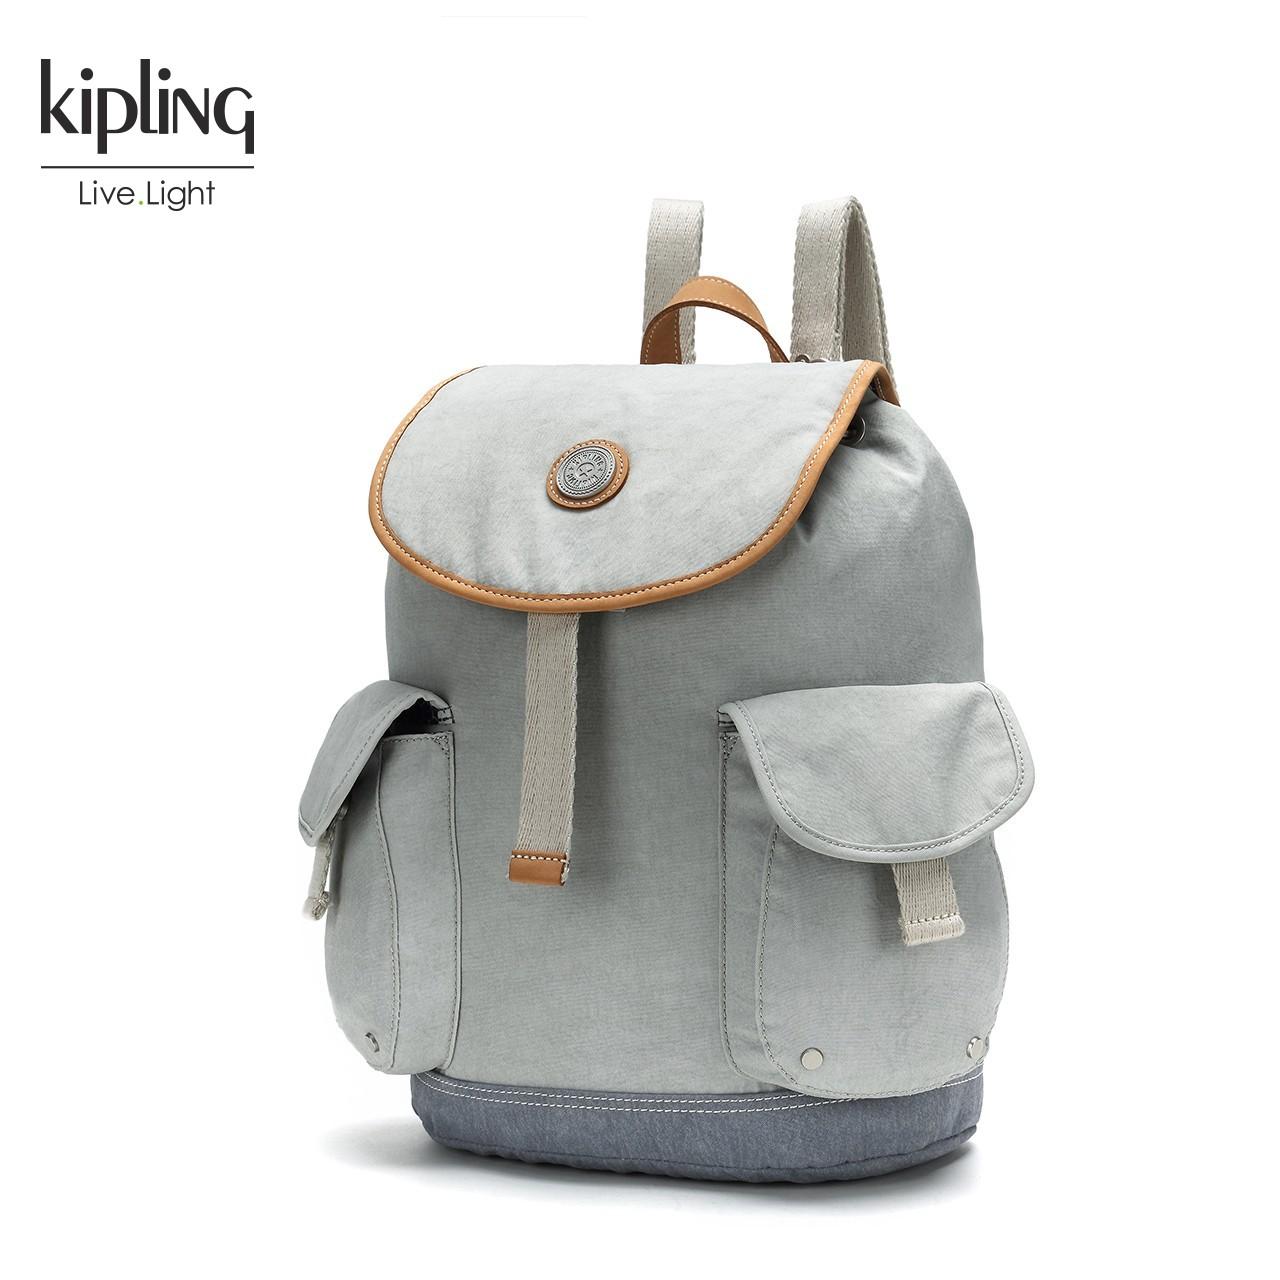 Kipling凯浦林官网2018新款K22068双肩背包休闲背包男女背包